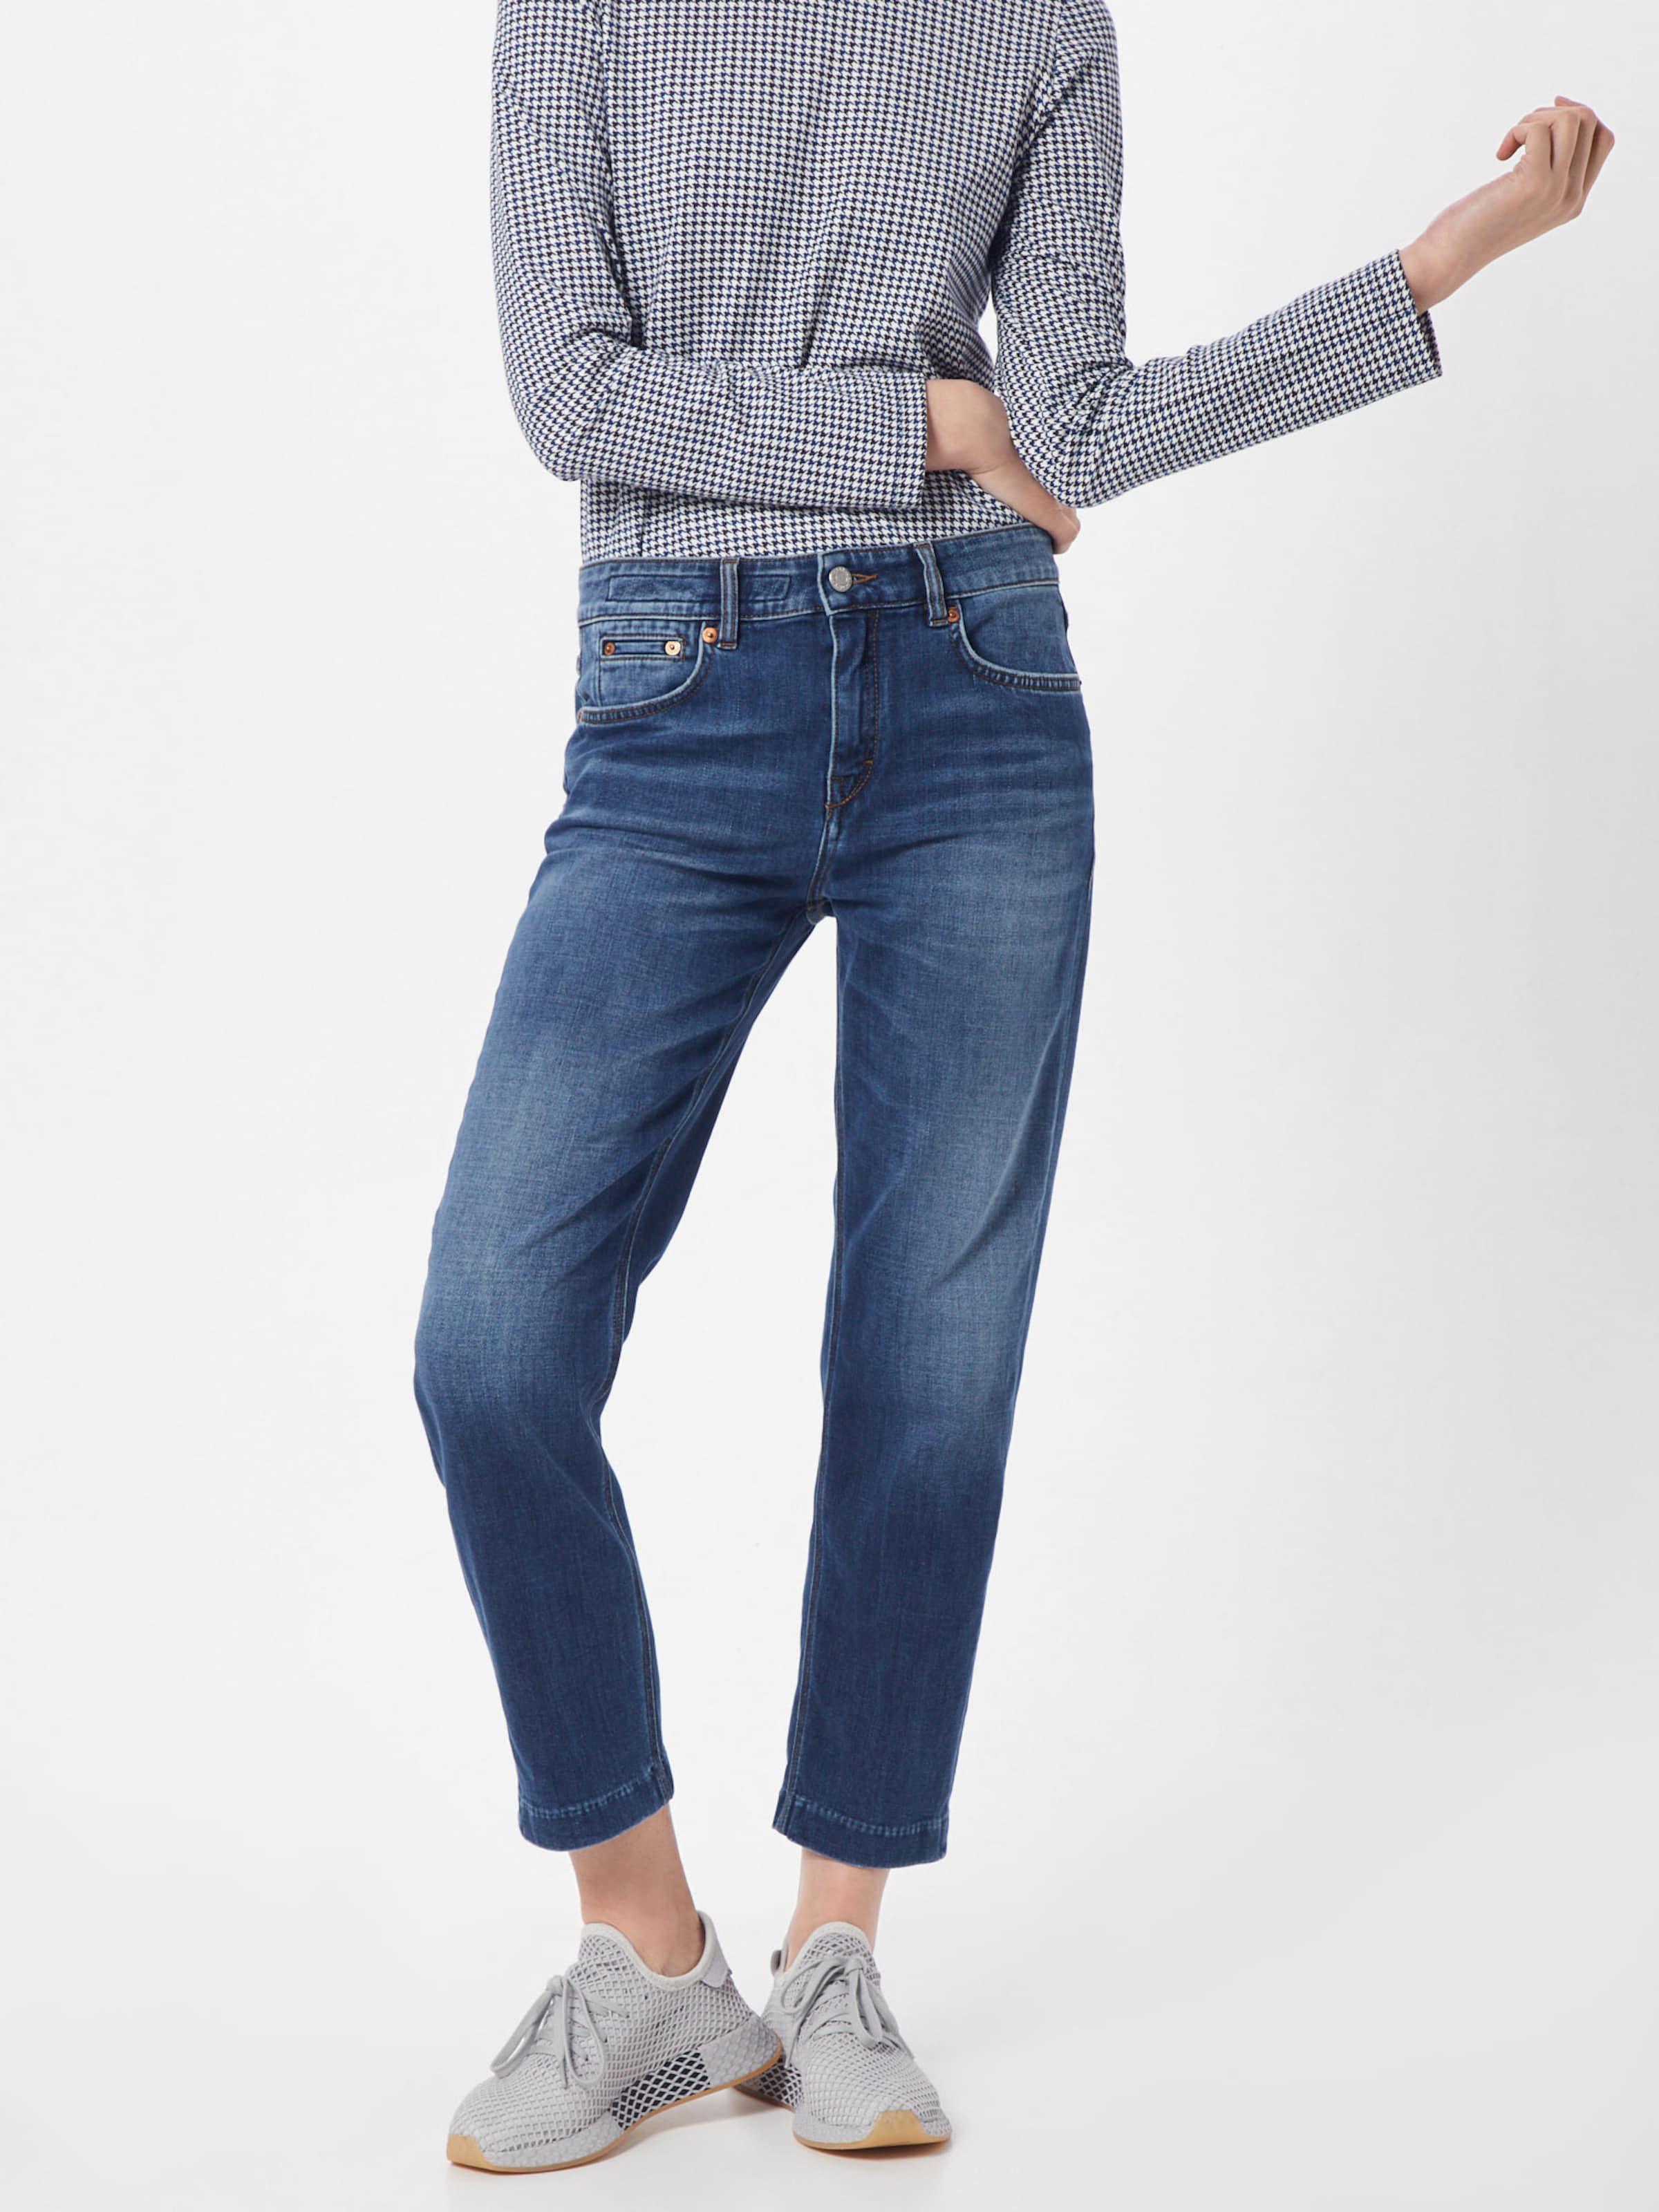 Drykorn Jeans In In Blue Denim Denim Jeans Drykorn In Blue Jeans Drykorn VjqMpGLzSU